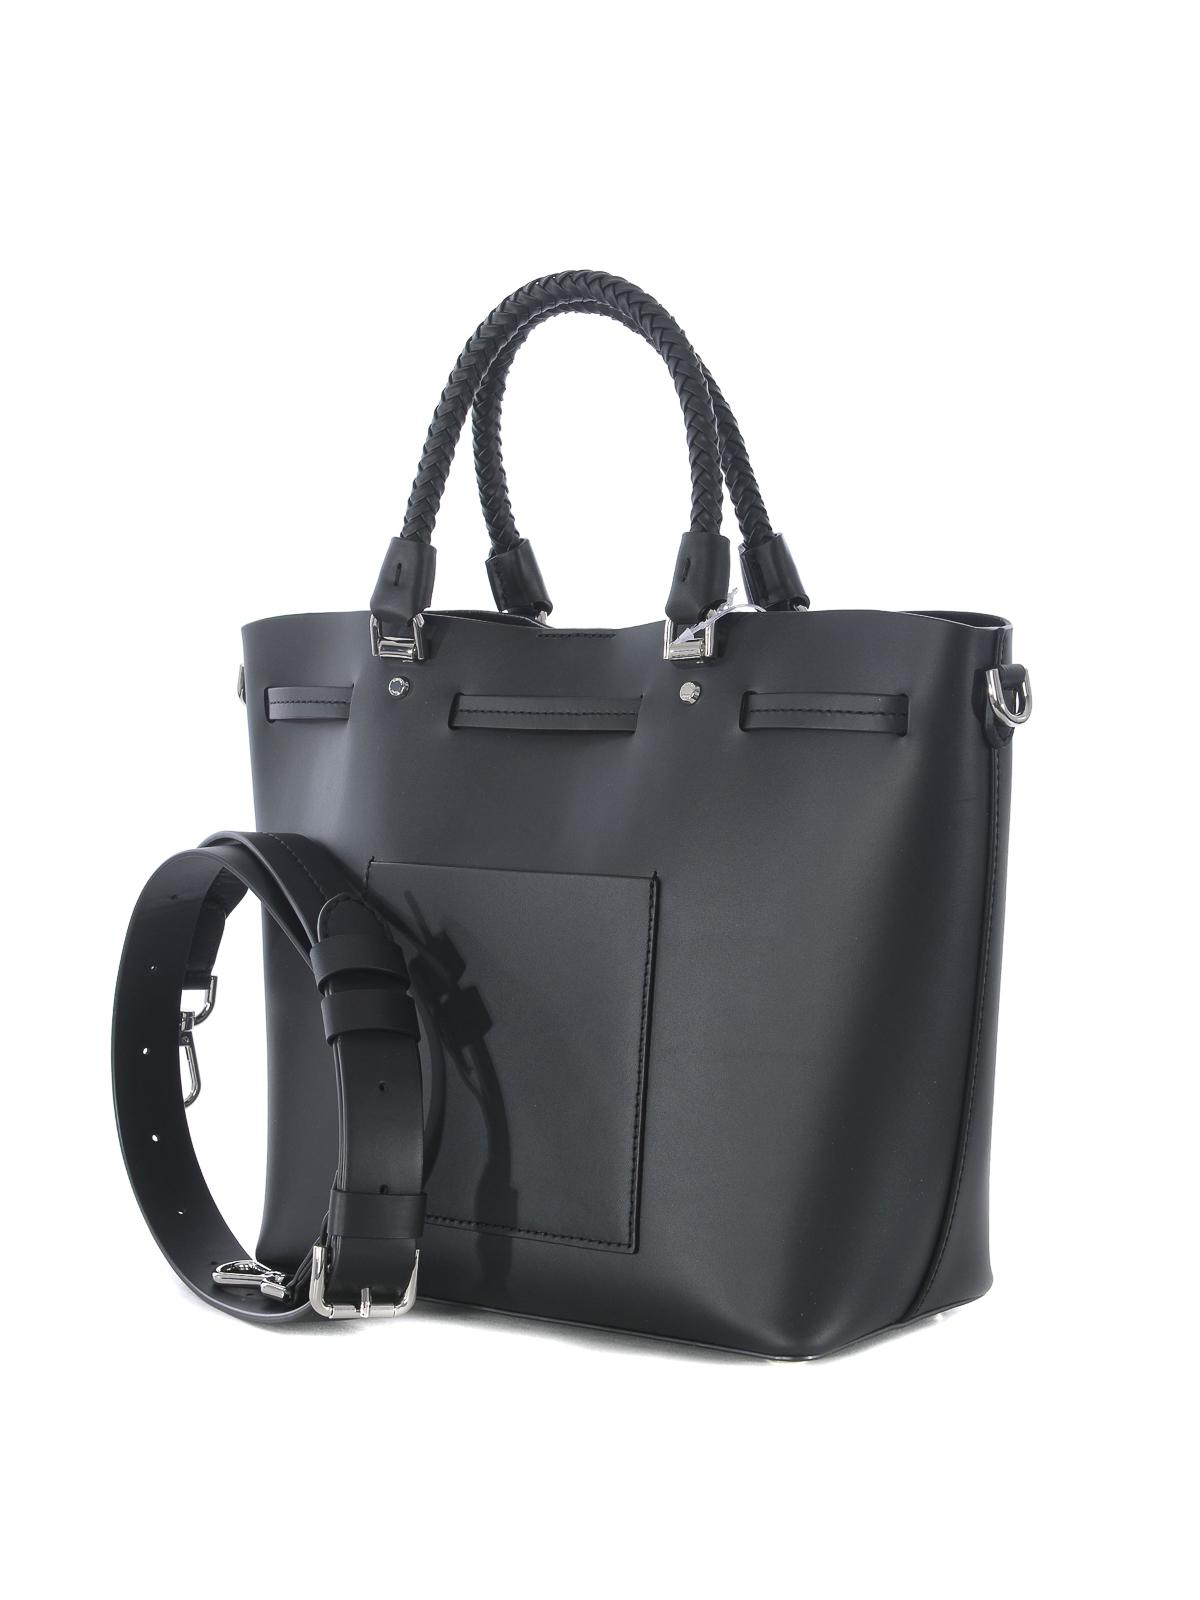 7350c3d69f7bda iKRIX MICHAEL KORS: Bucket bags - Blakely M black leather bucket bag